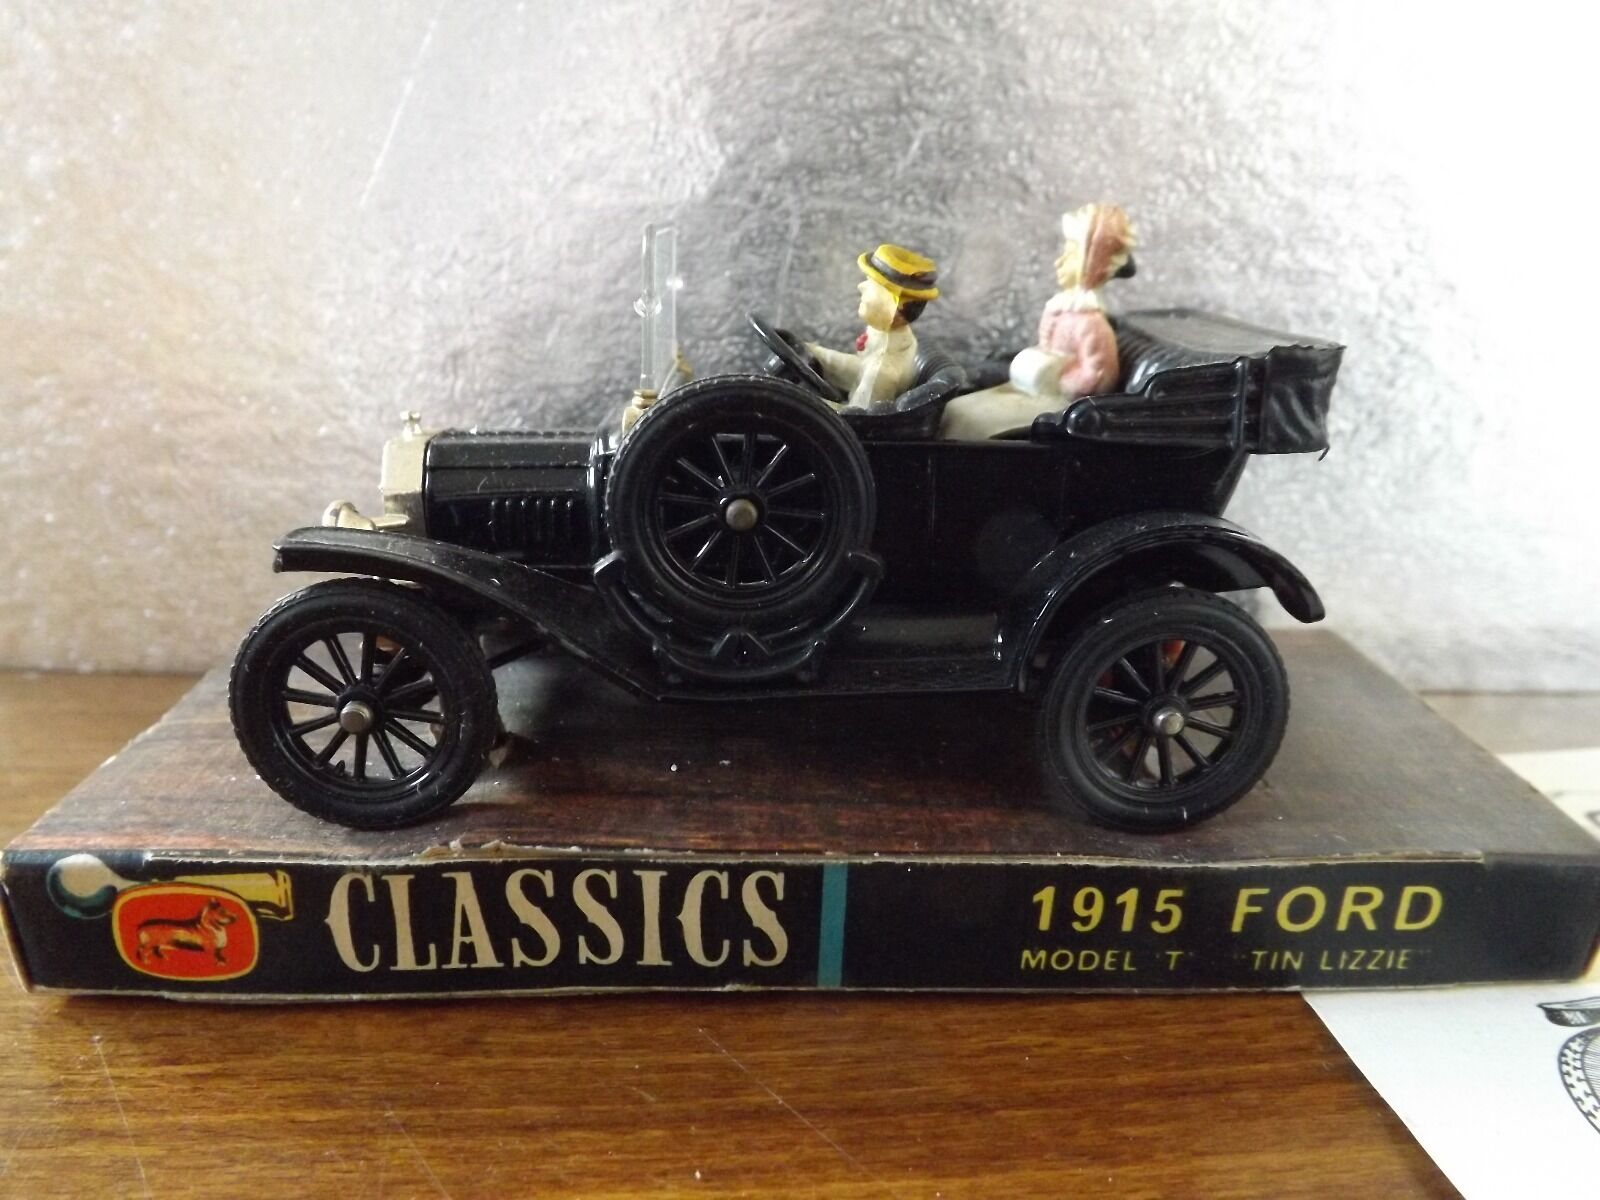 CORGI CLASSICS 1915 FORD MODEL T ( TIN LIZZIE) IN ORIGINAL BOX.